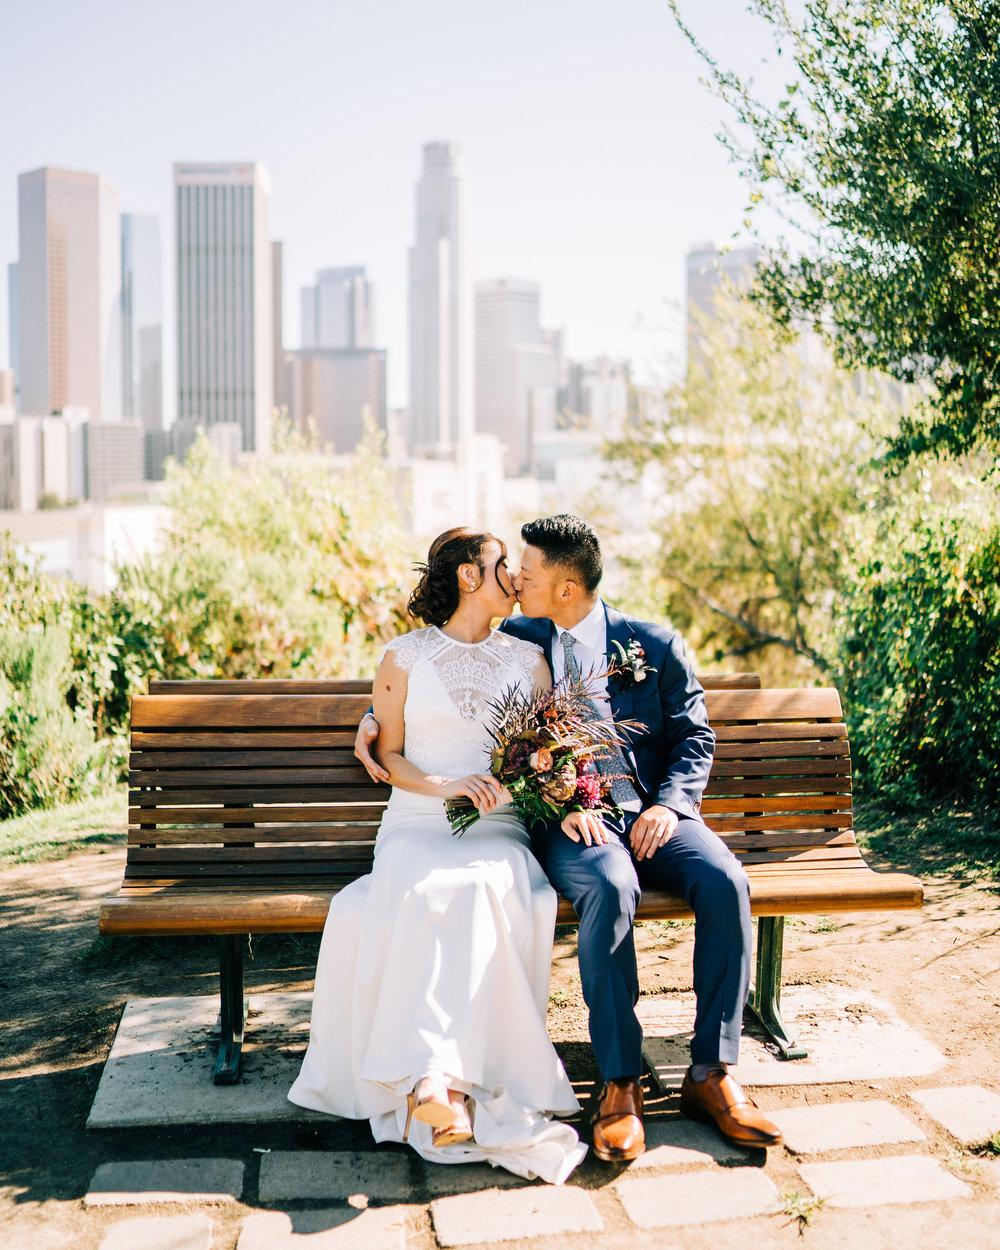 the-alley-at-daily-dose-wedding-brandon-bibbins-photography-1 (2).jpg